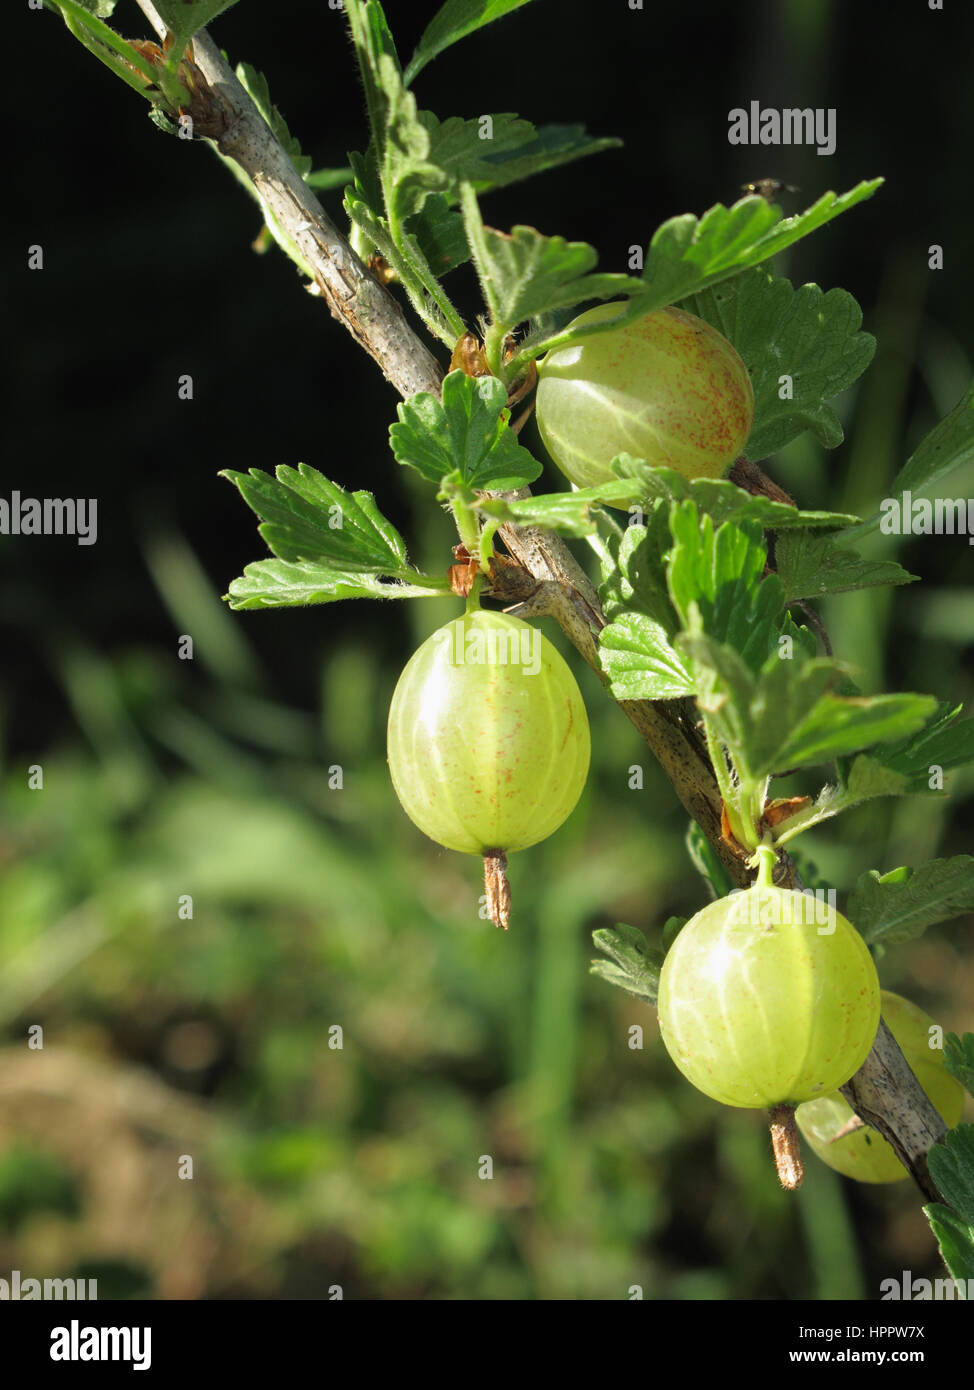 Ribes uva-crispa close up - Stock Image